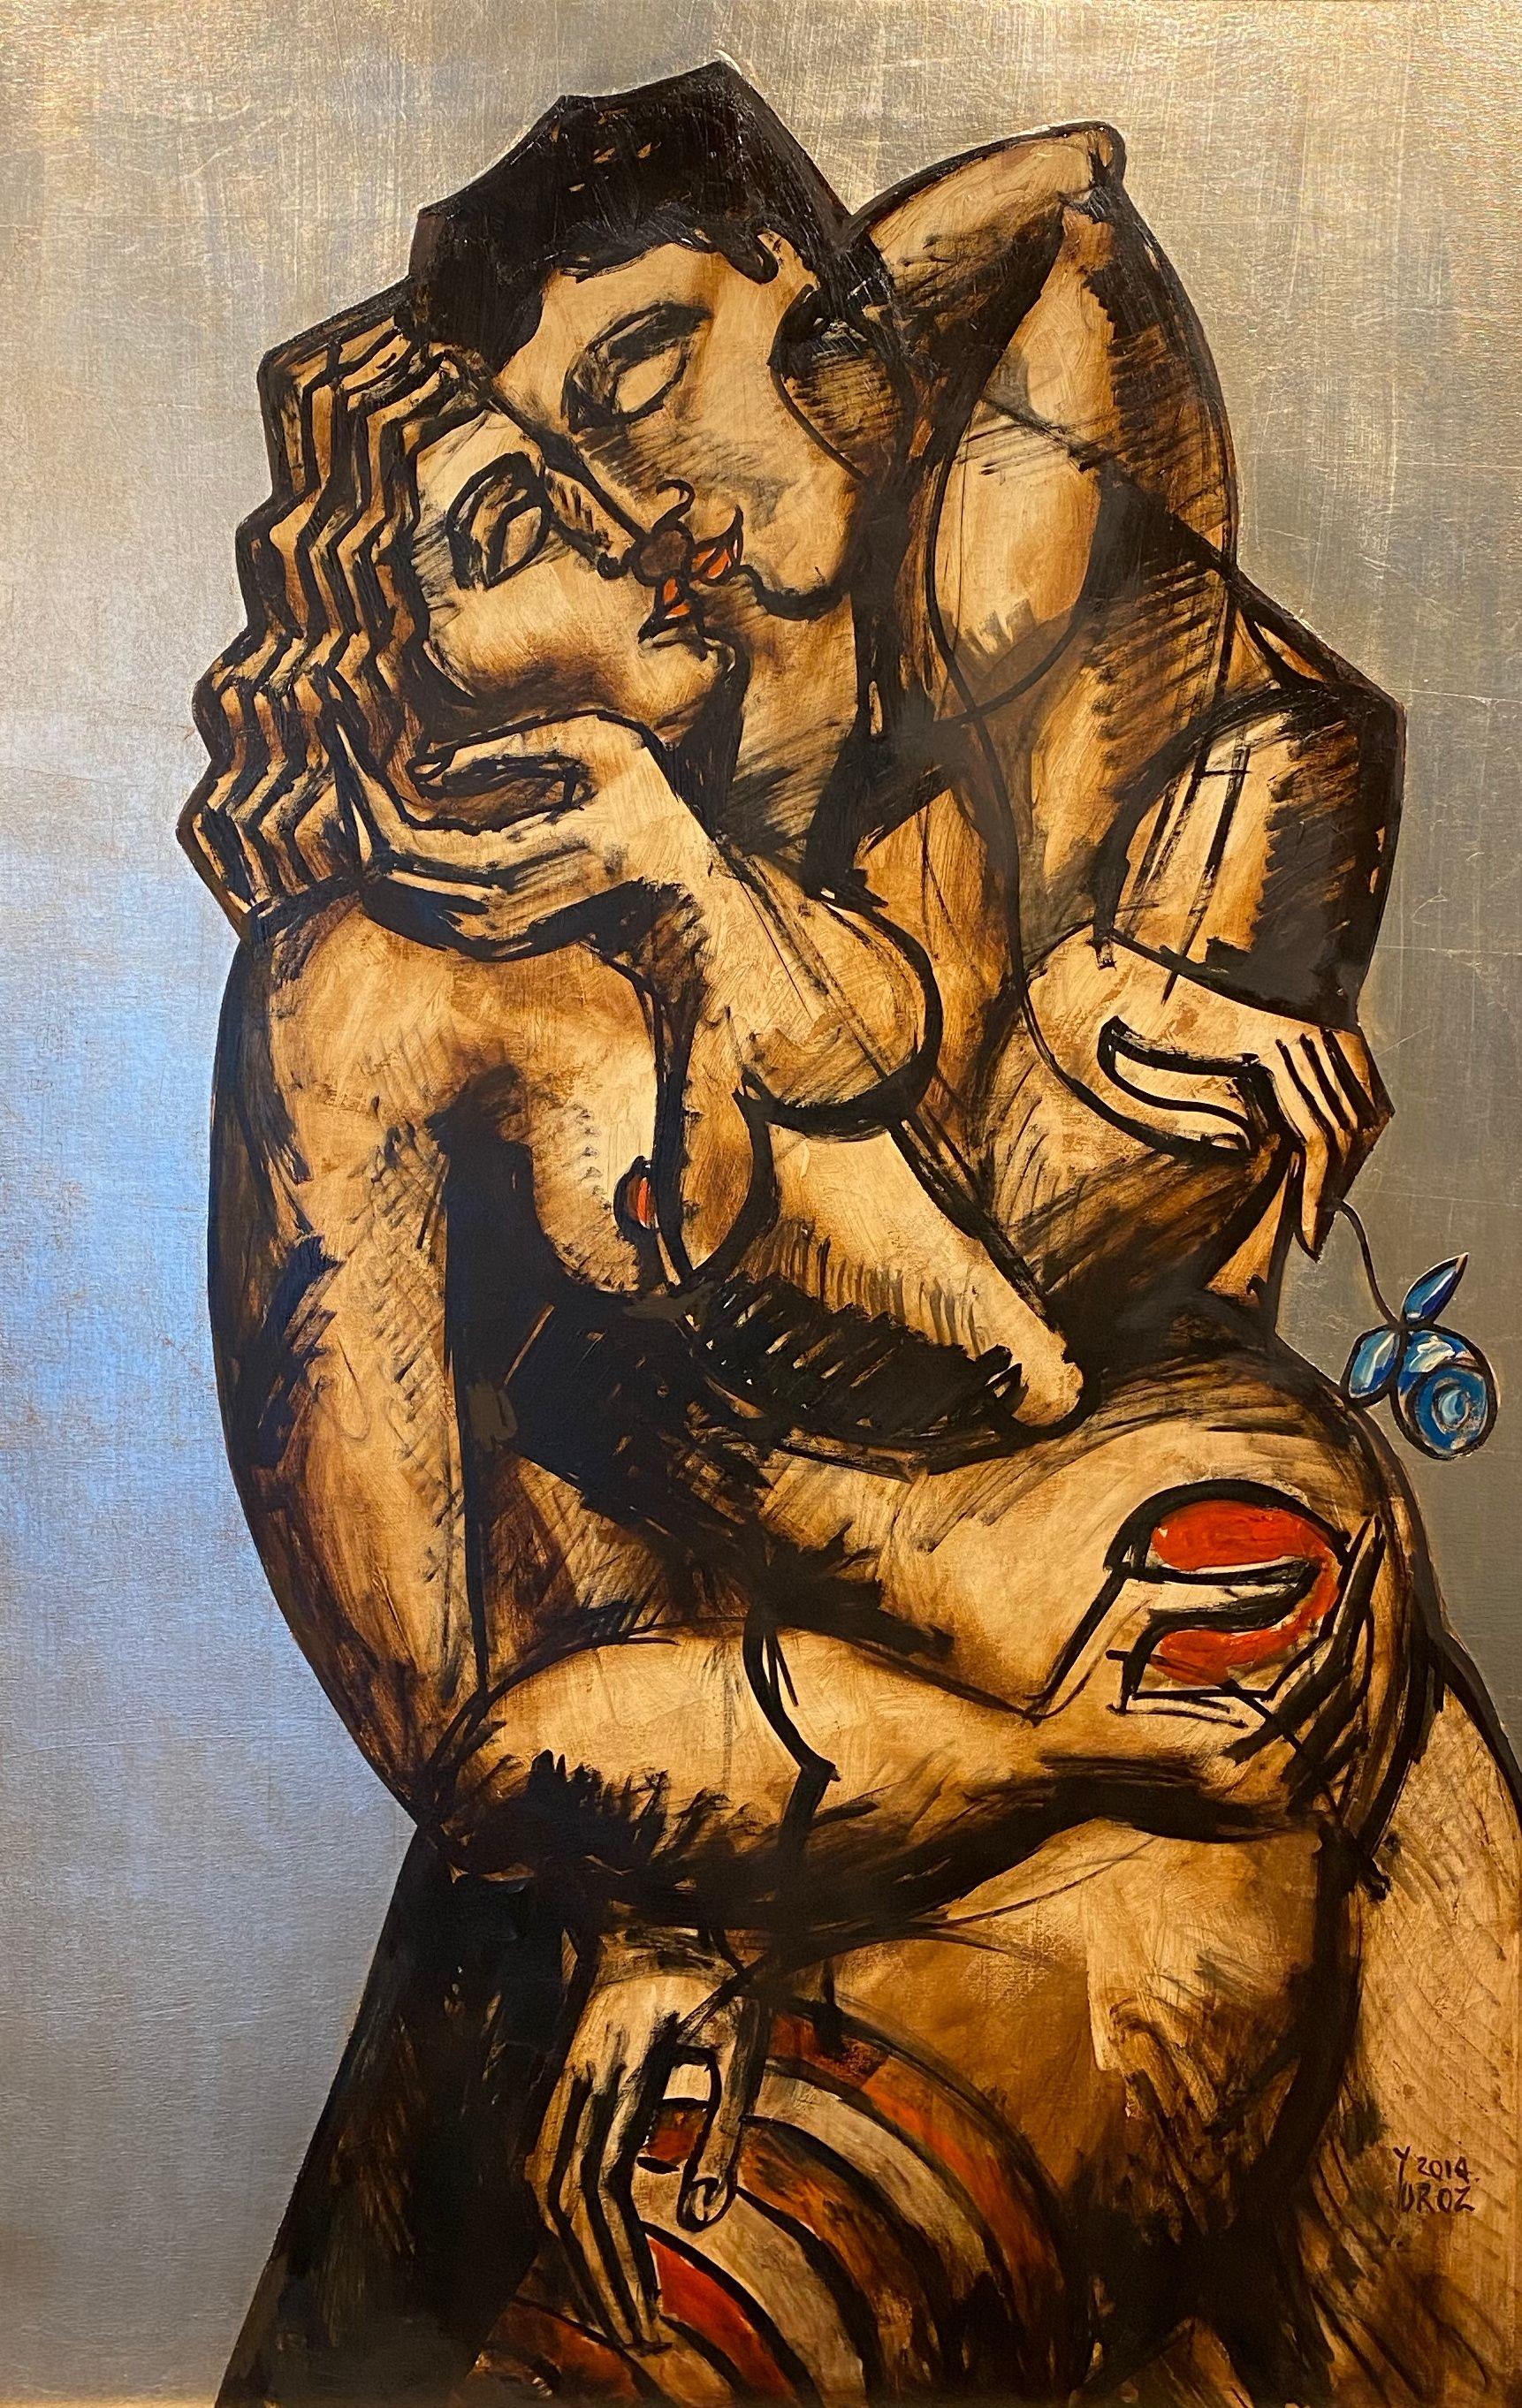 Yuroz - Impassionate Caress - Original Painting - Off The Wall Gallery Houston